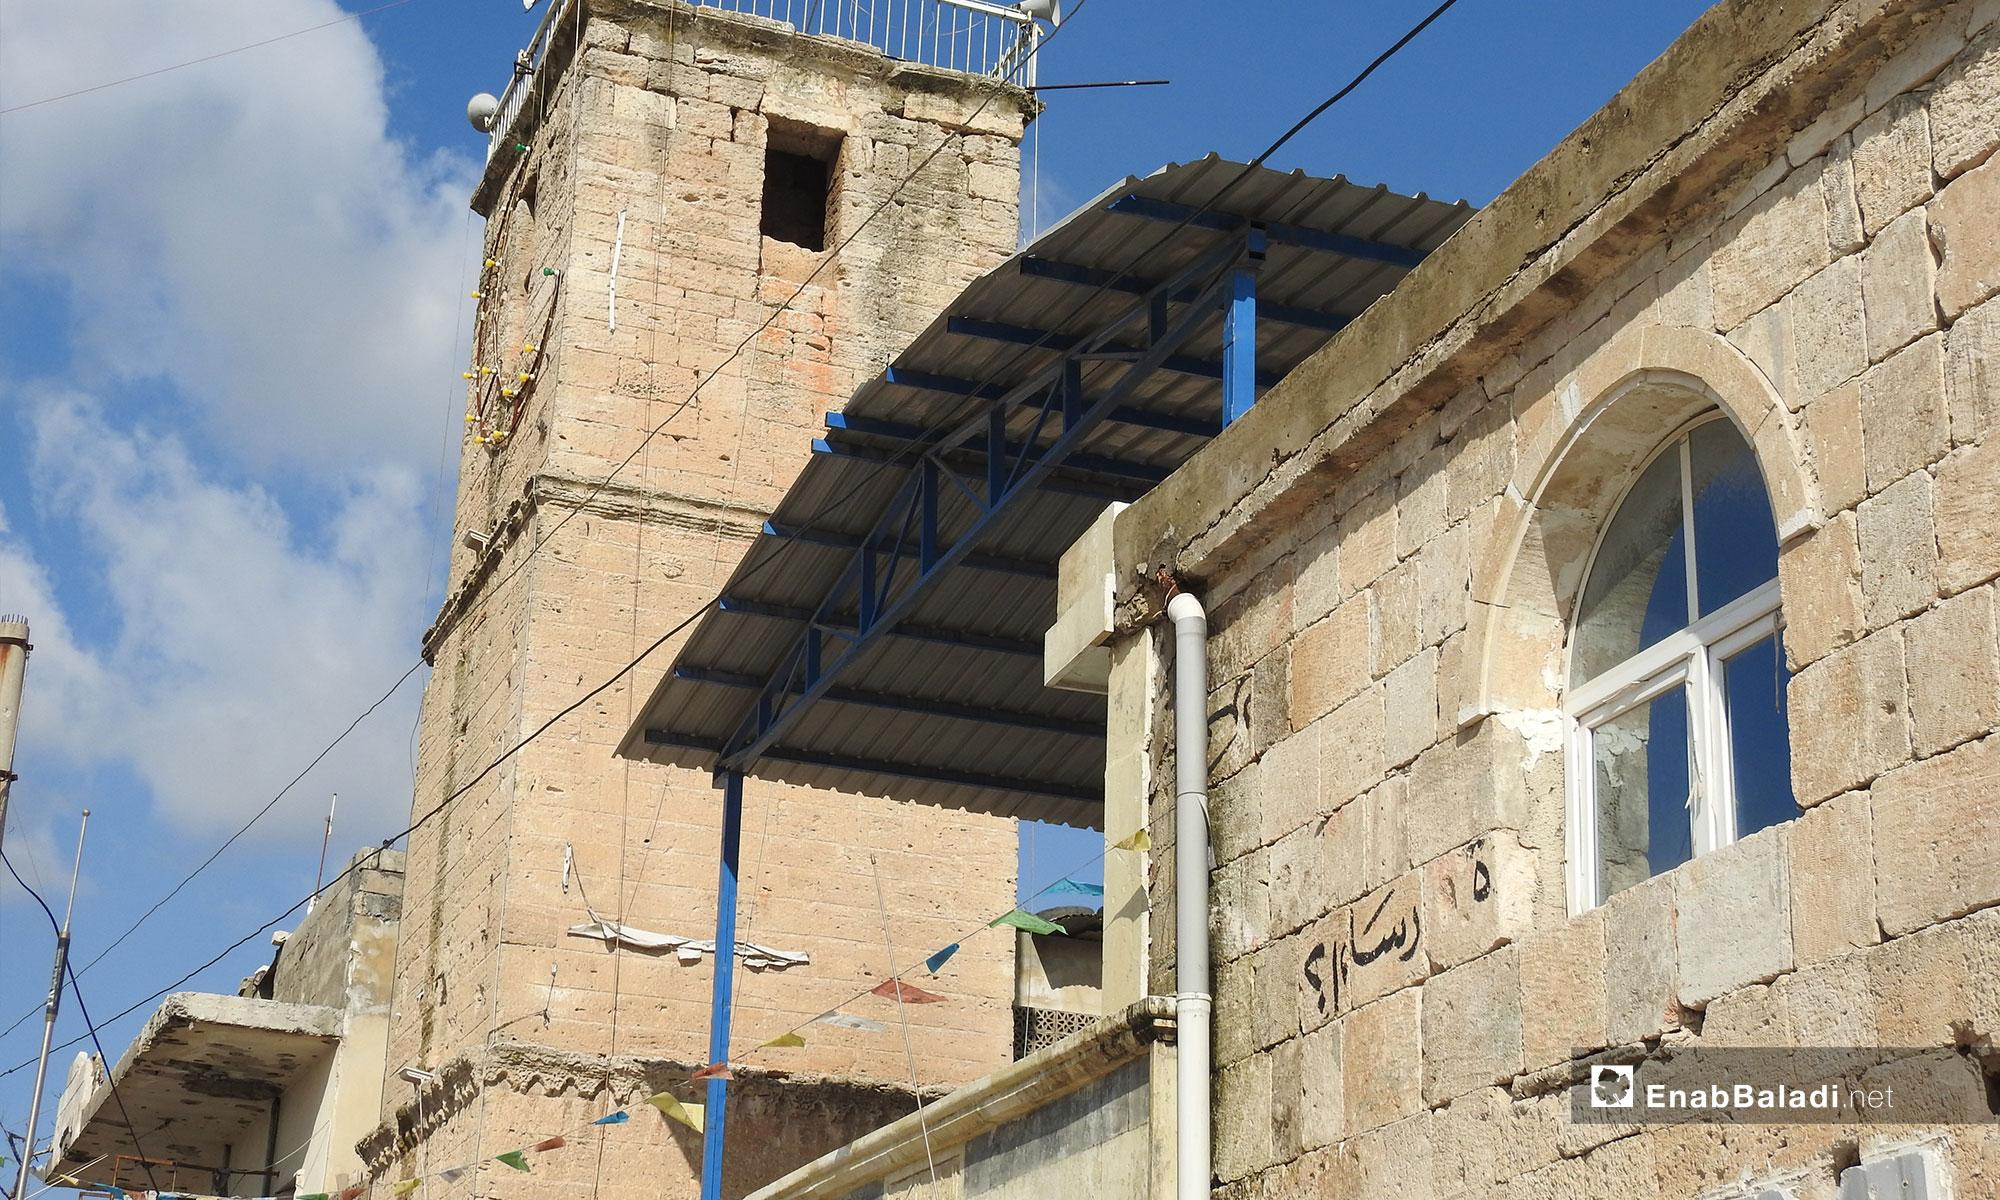 The Great Mosque in Bizaah City, eastern rural Aleppo – (Enab Baladi)